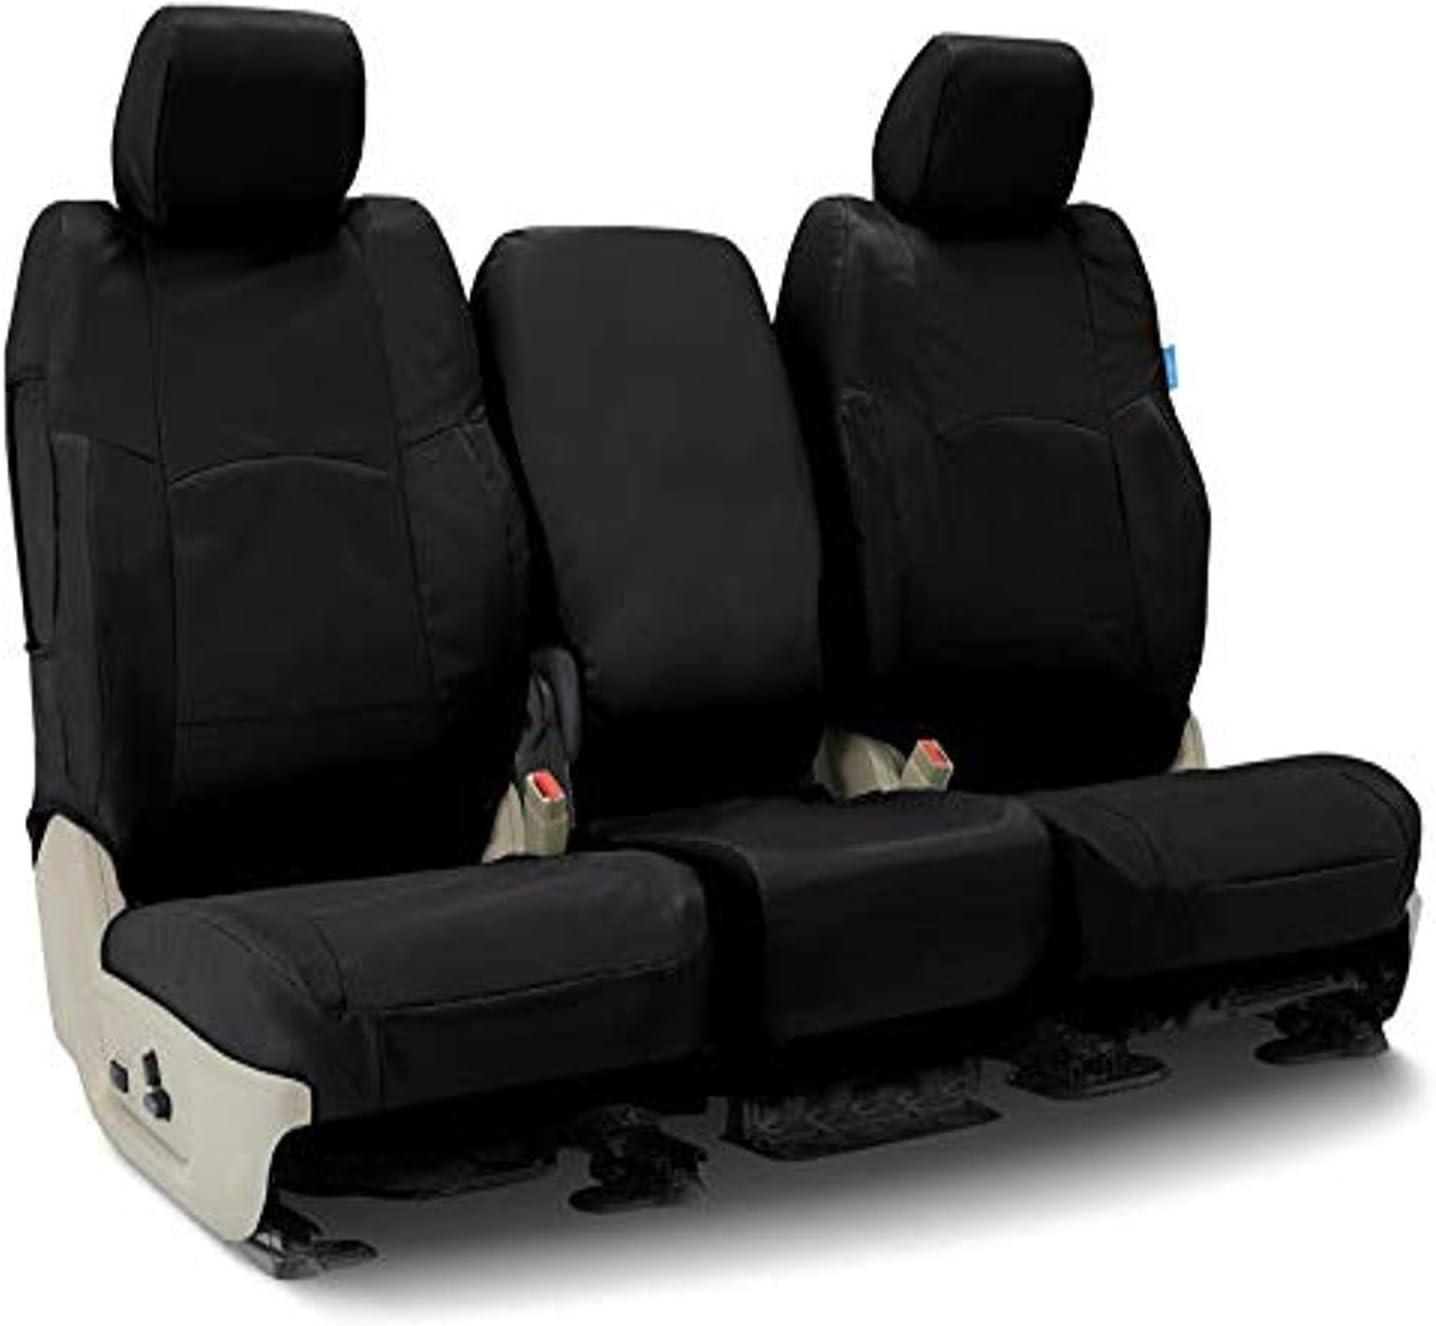 Black Nylon Carpet Coverking Custom Fit Front and Rear Floor Mats for Select Taurus Models CFMBX1FD7343